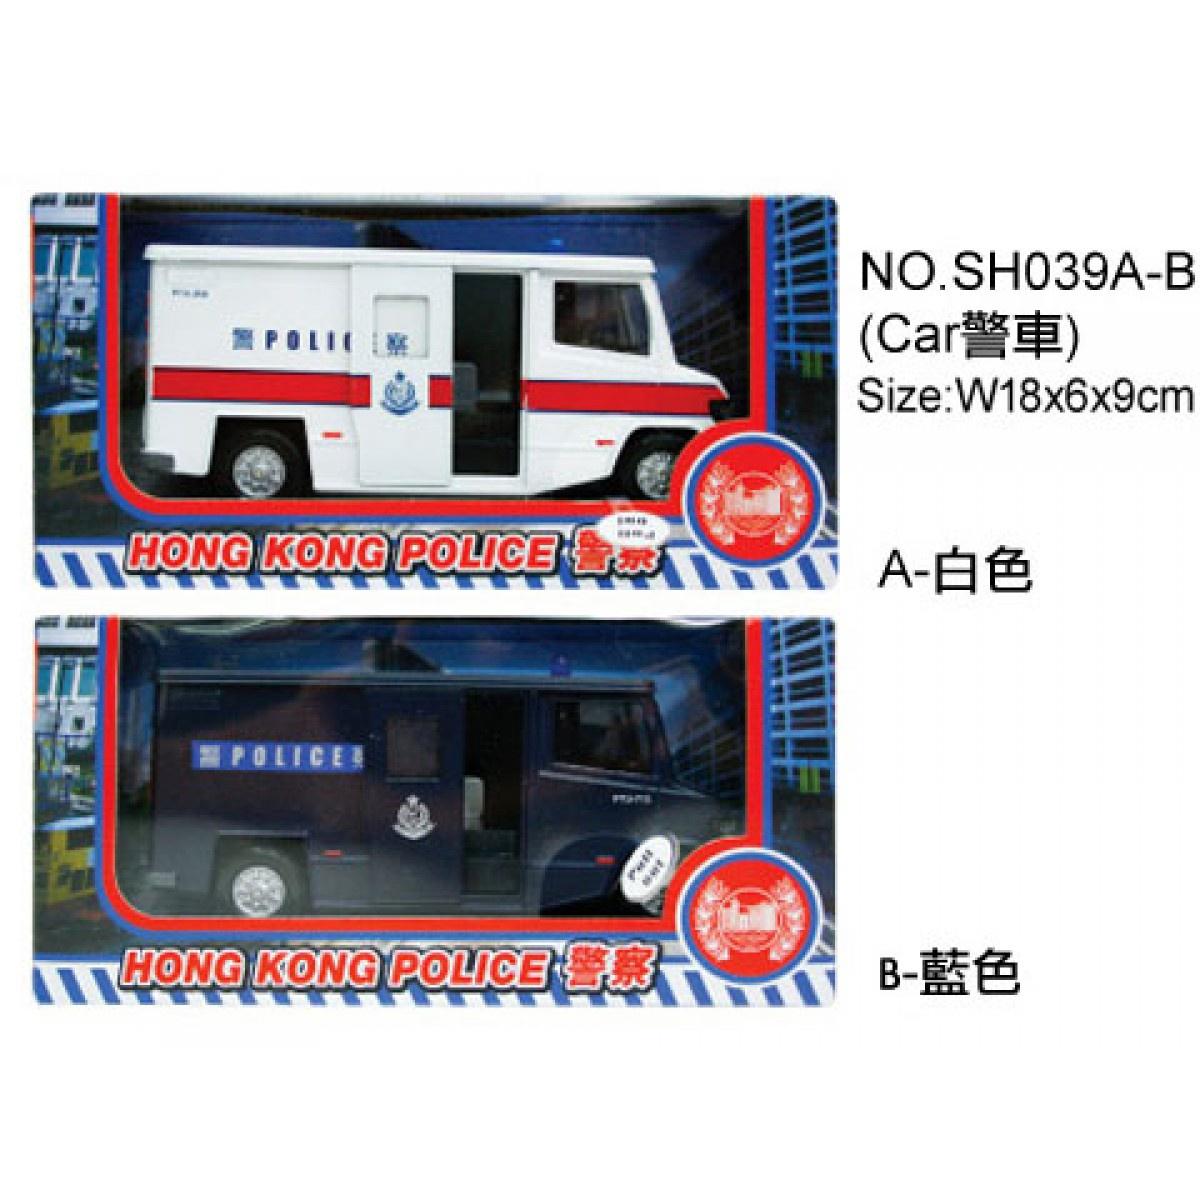 HONG KONG POLICE W/SOUND